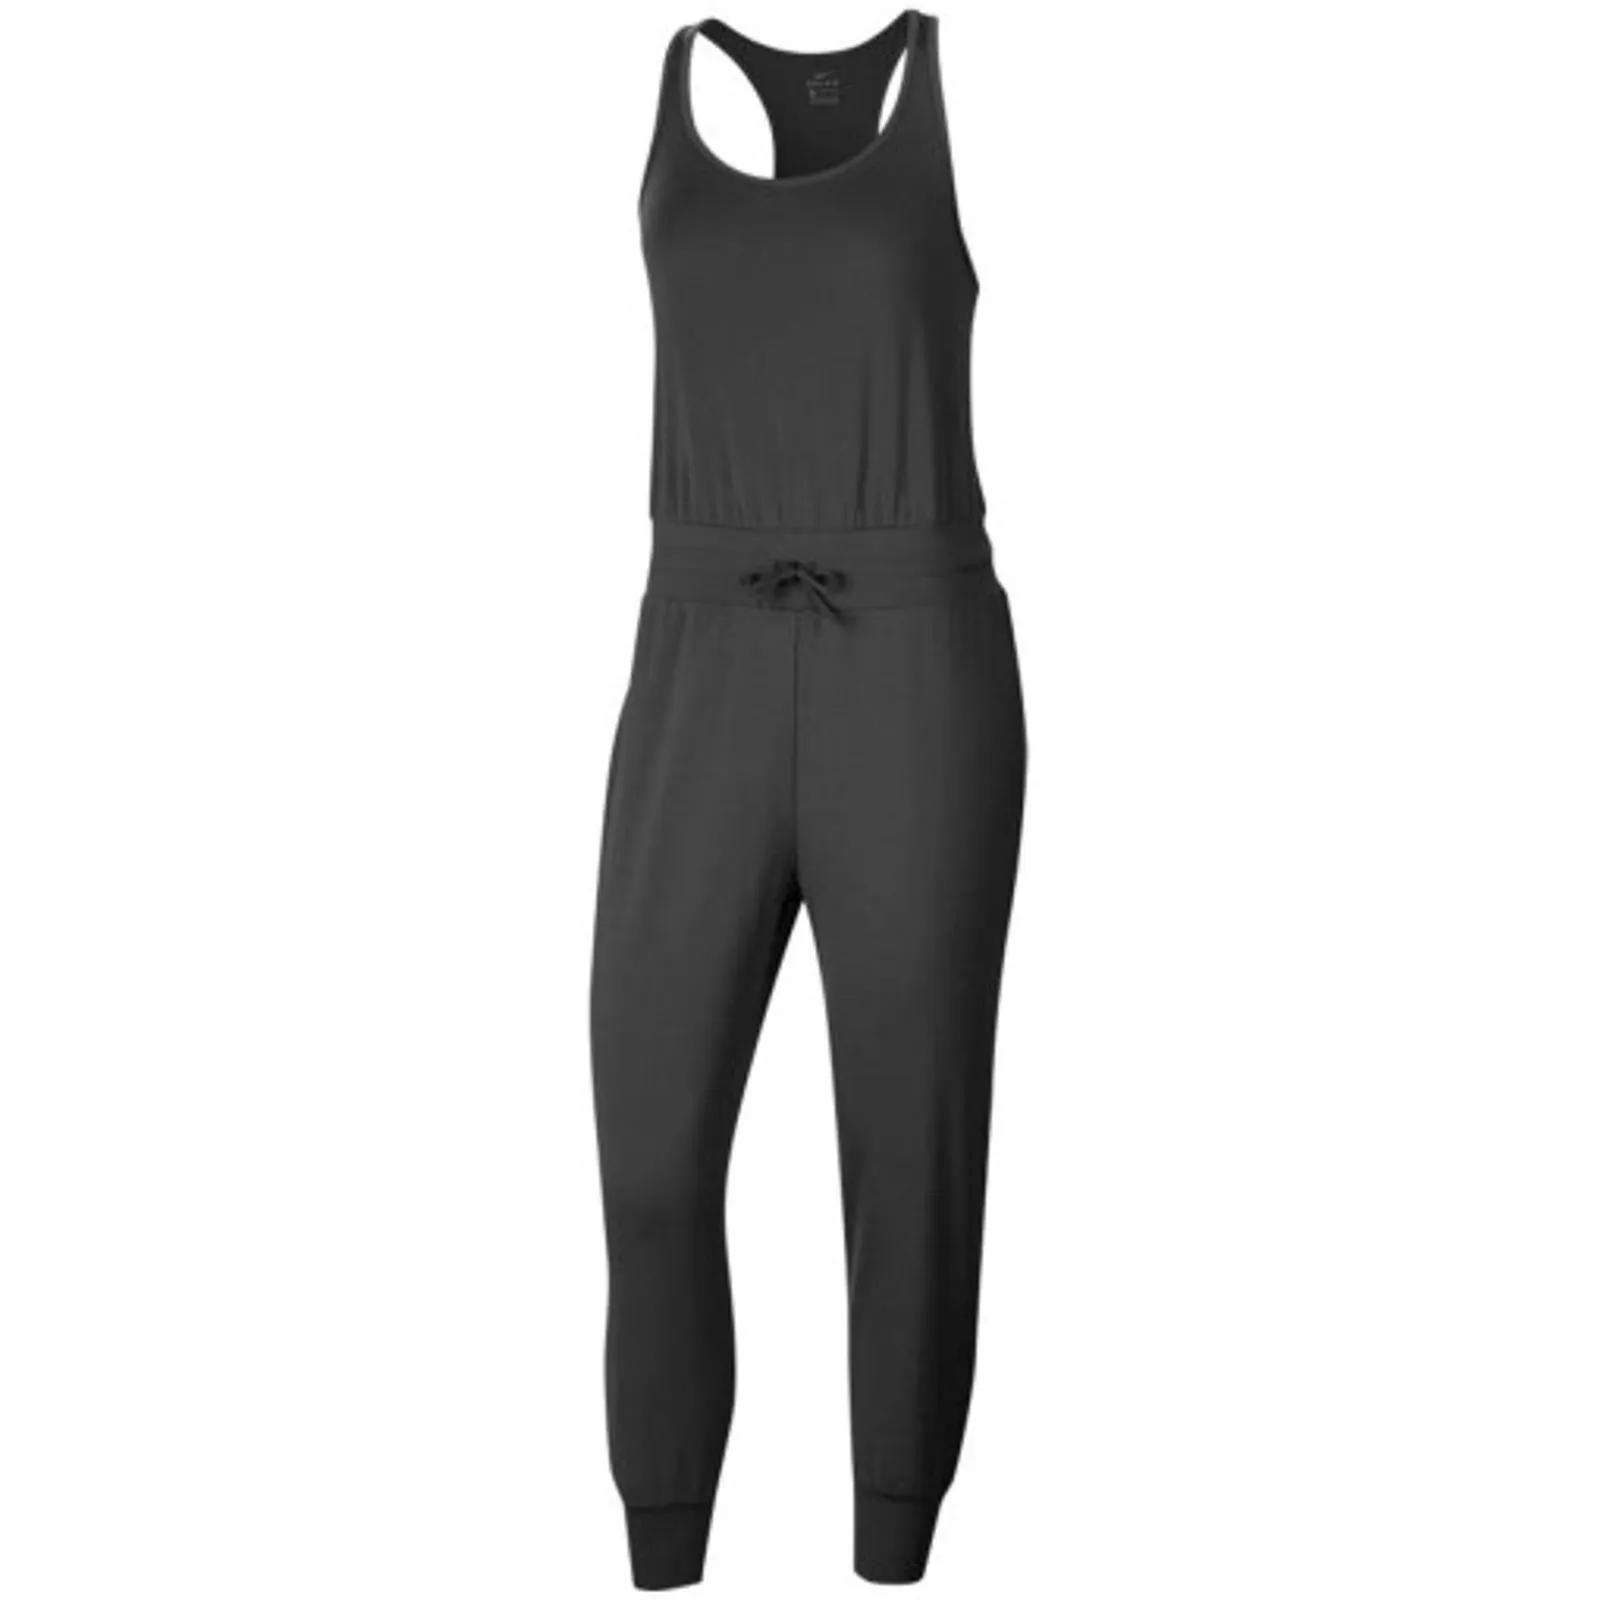 Macacão Nike Yoga 7/88 Jumpsuit Feminino  - PROTENISTA